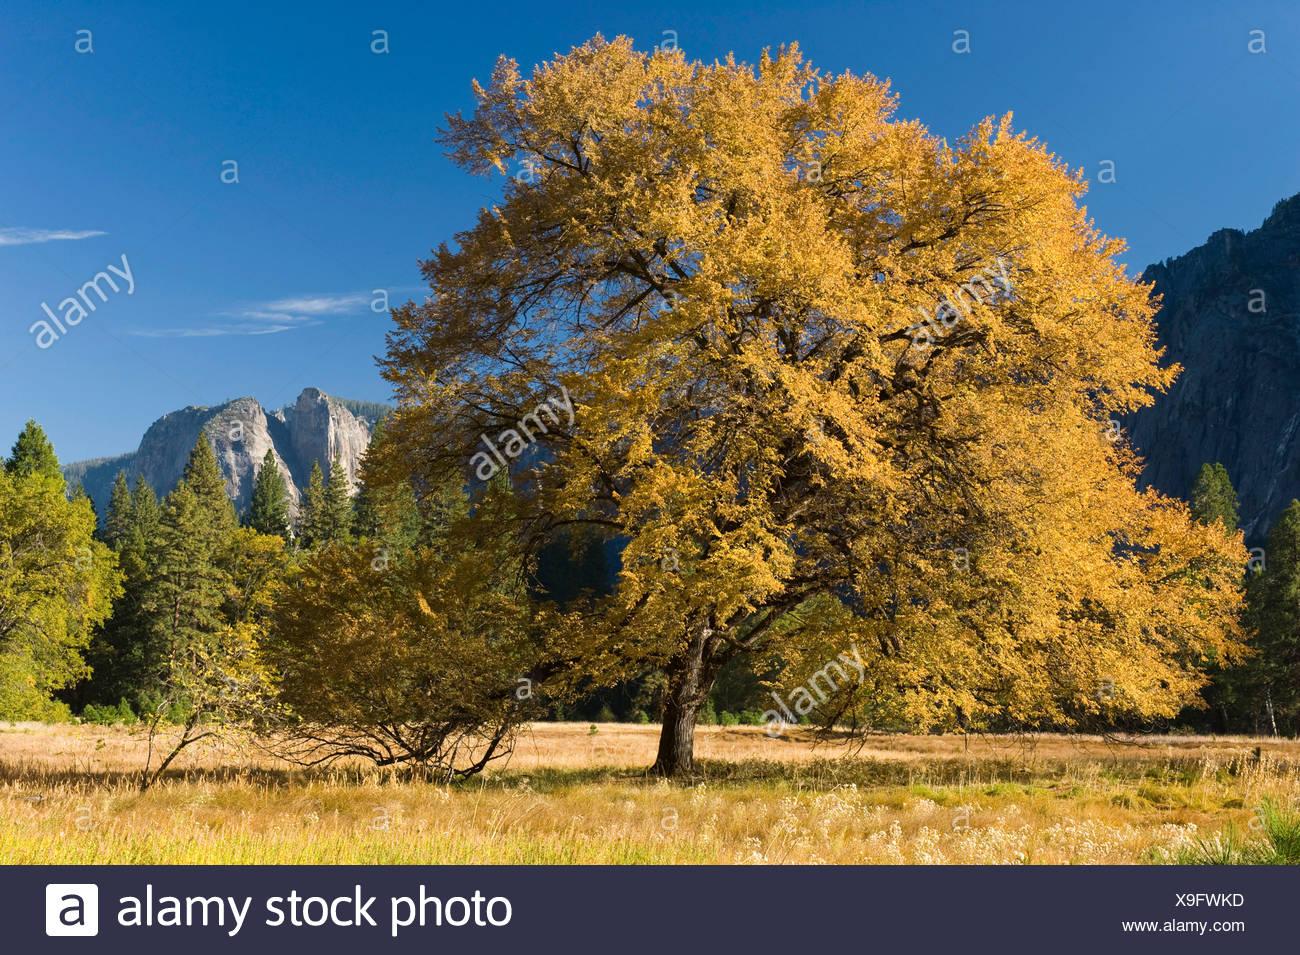 Oak tree (Quercus) in Yosemite Valley, Yosemite National Park, California, USA - Stock Image